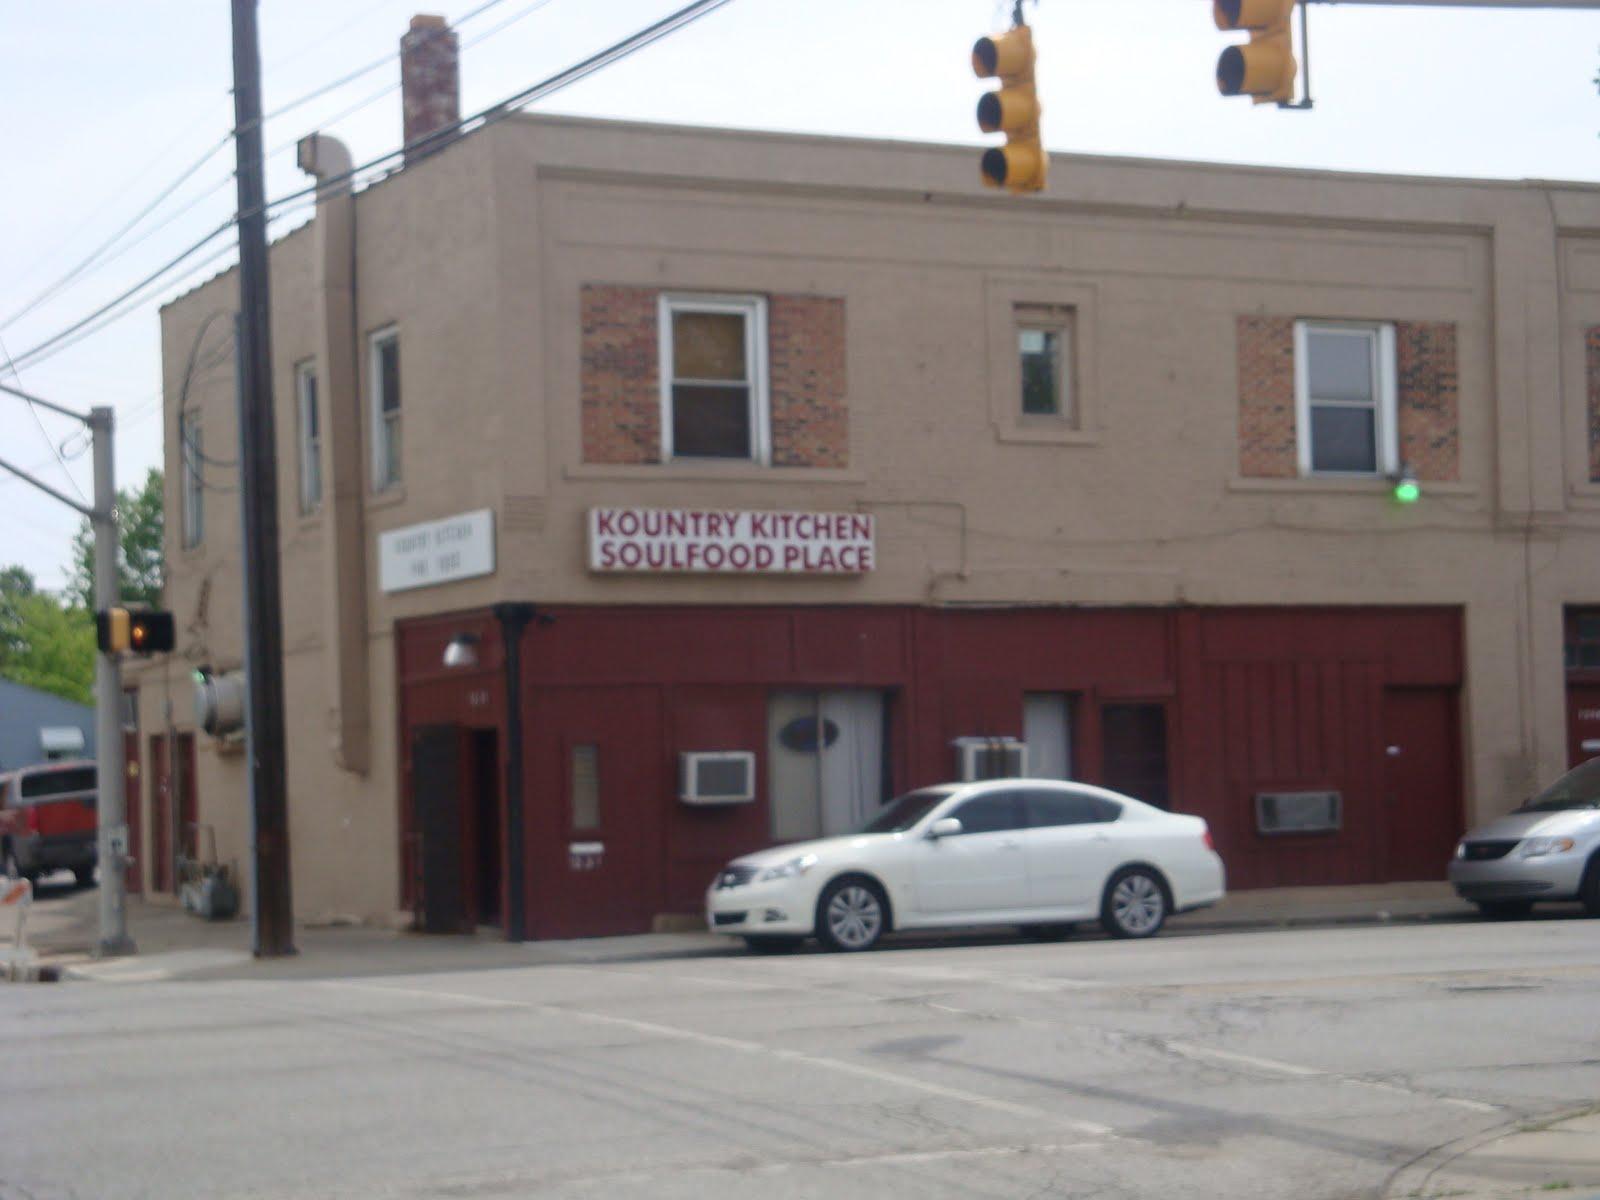 Indianapolis Restaurant Scene: Kountry Kitchen